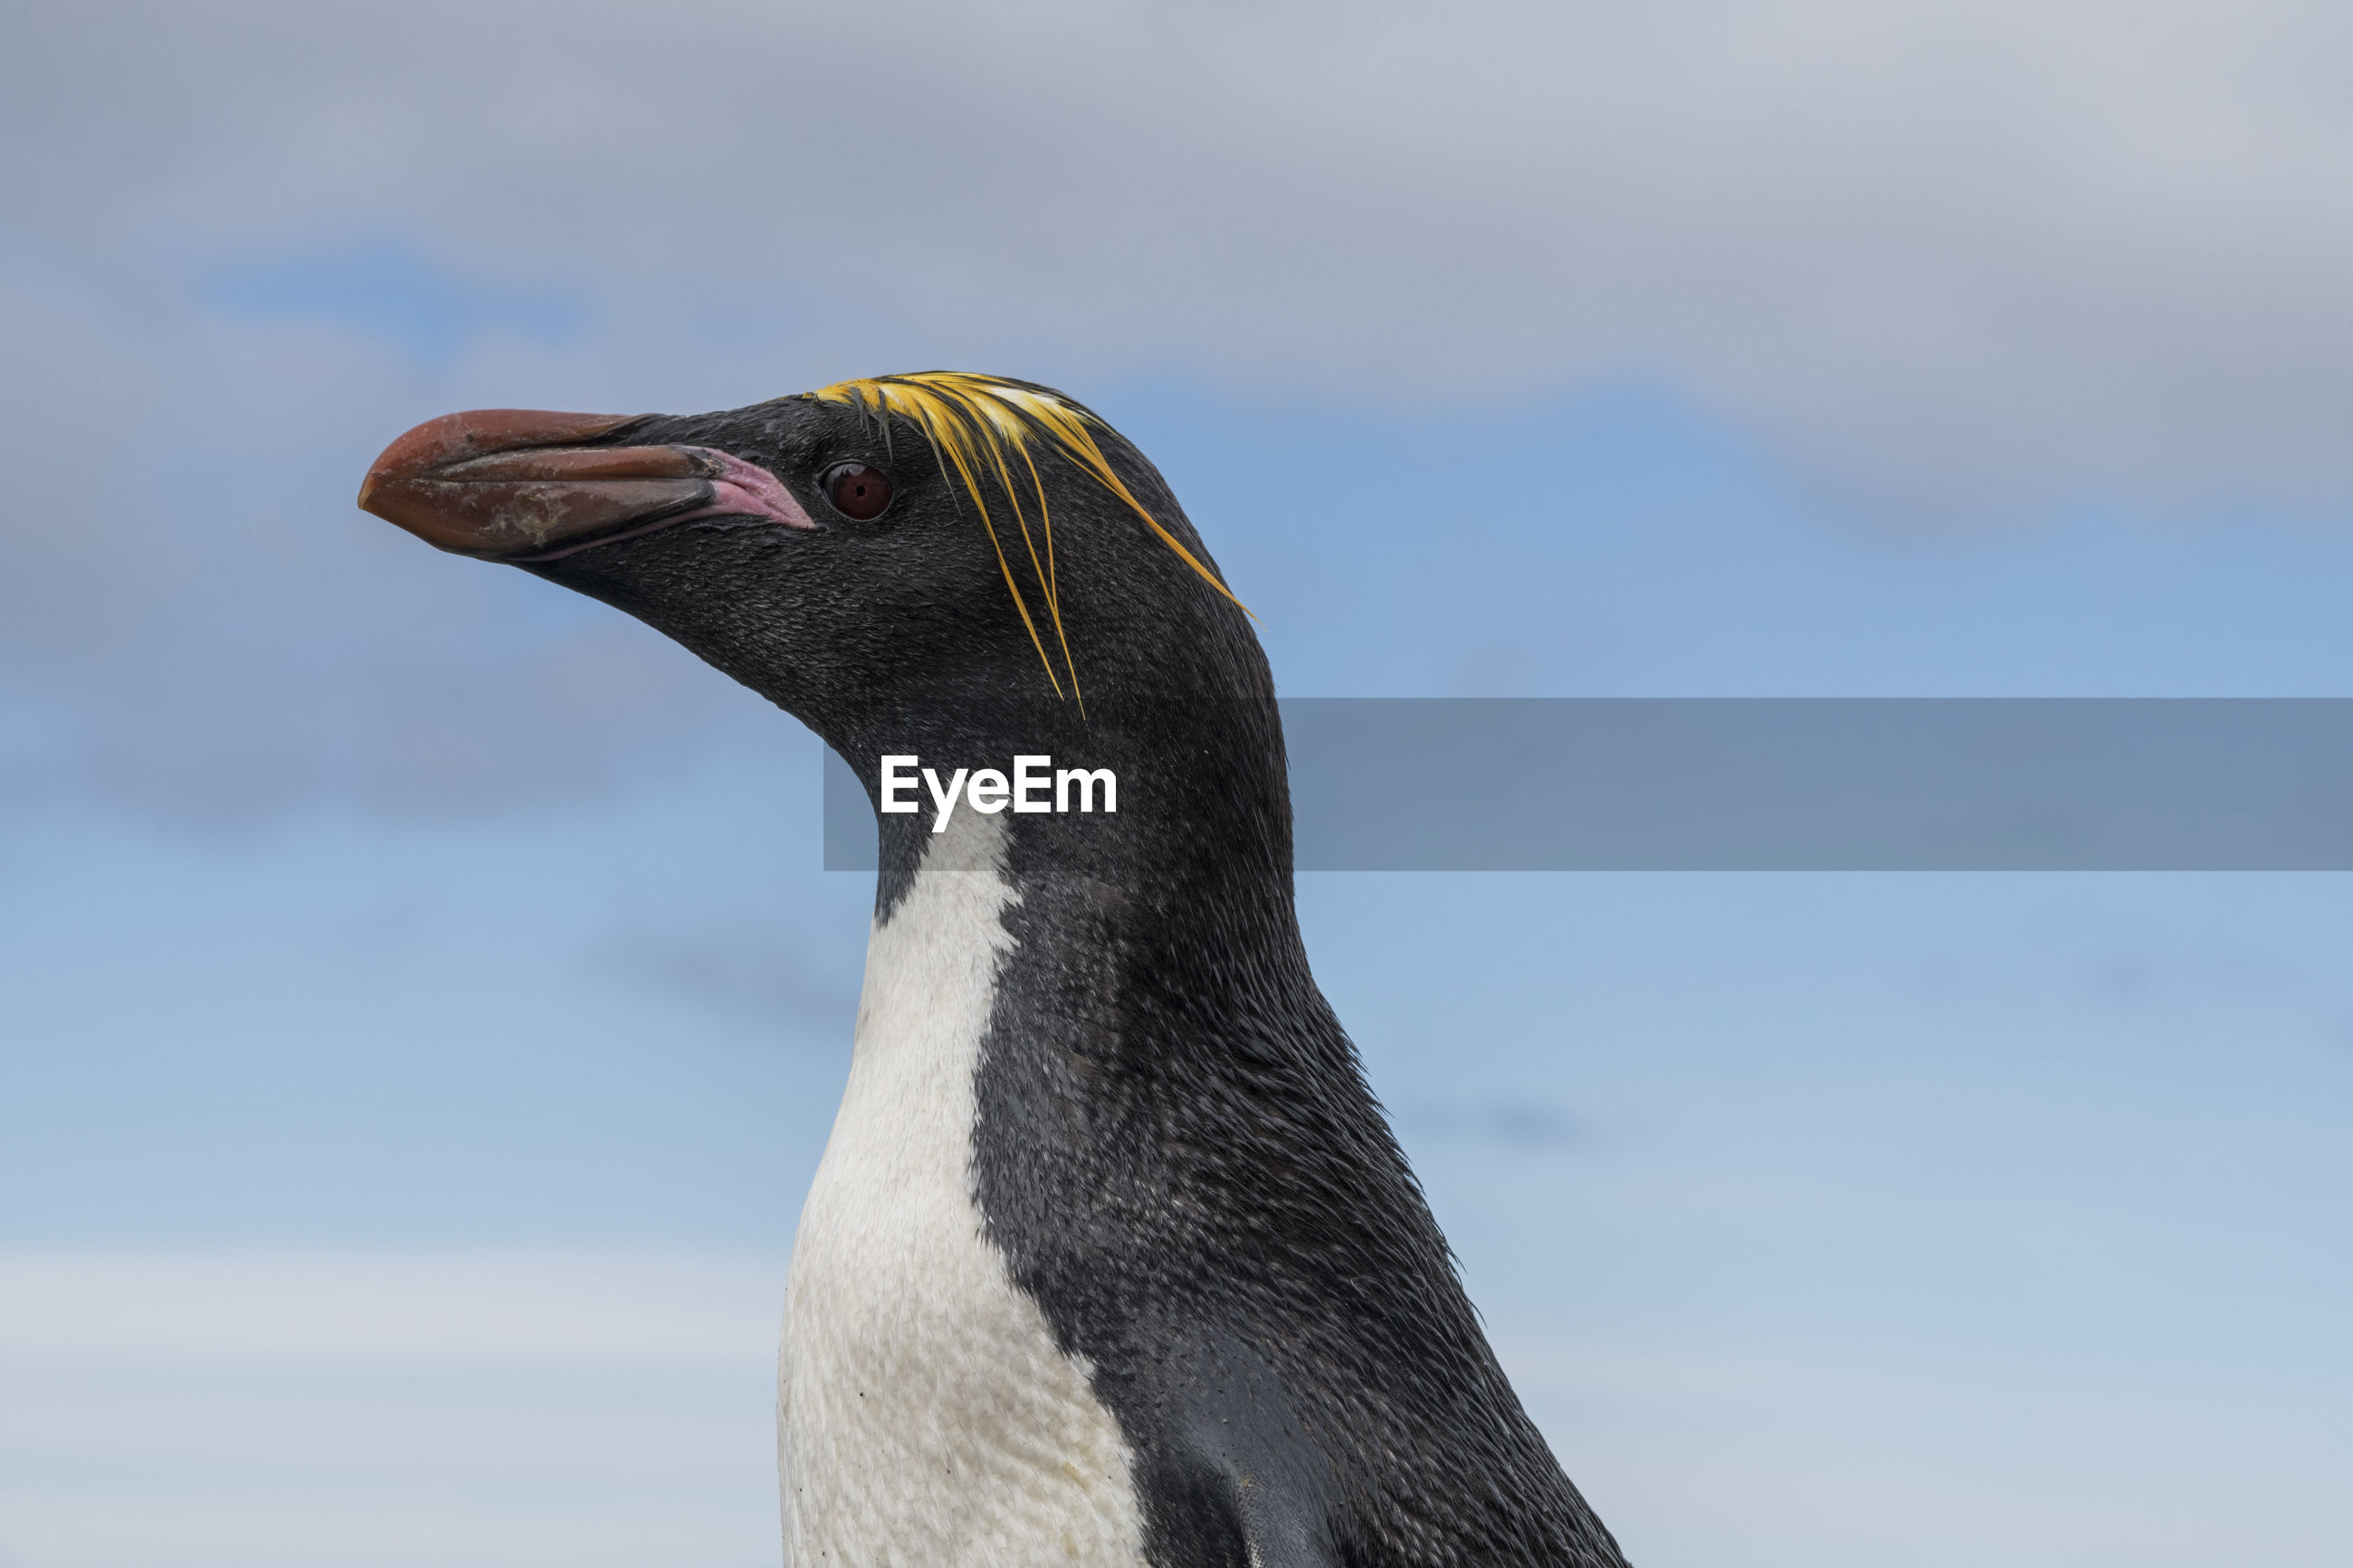 Elephant island, antarctica. close-up portraits of a  macaroni penguin